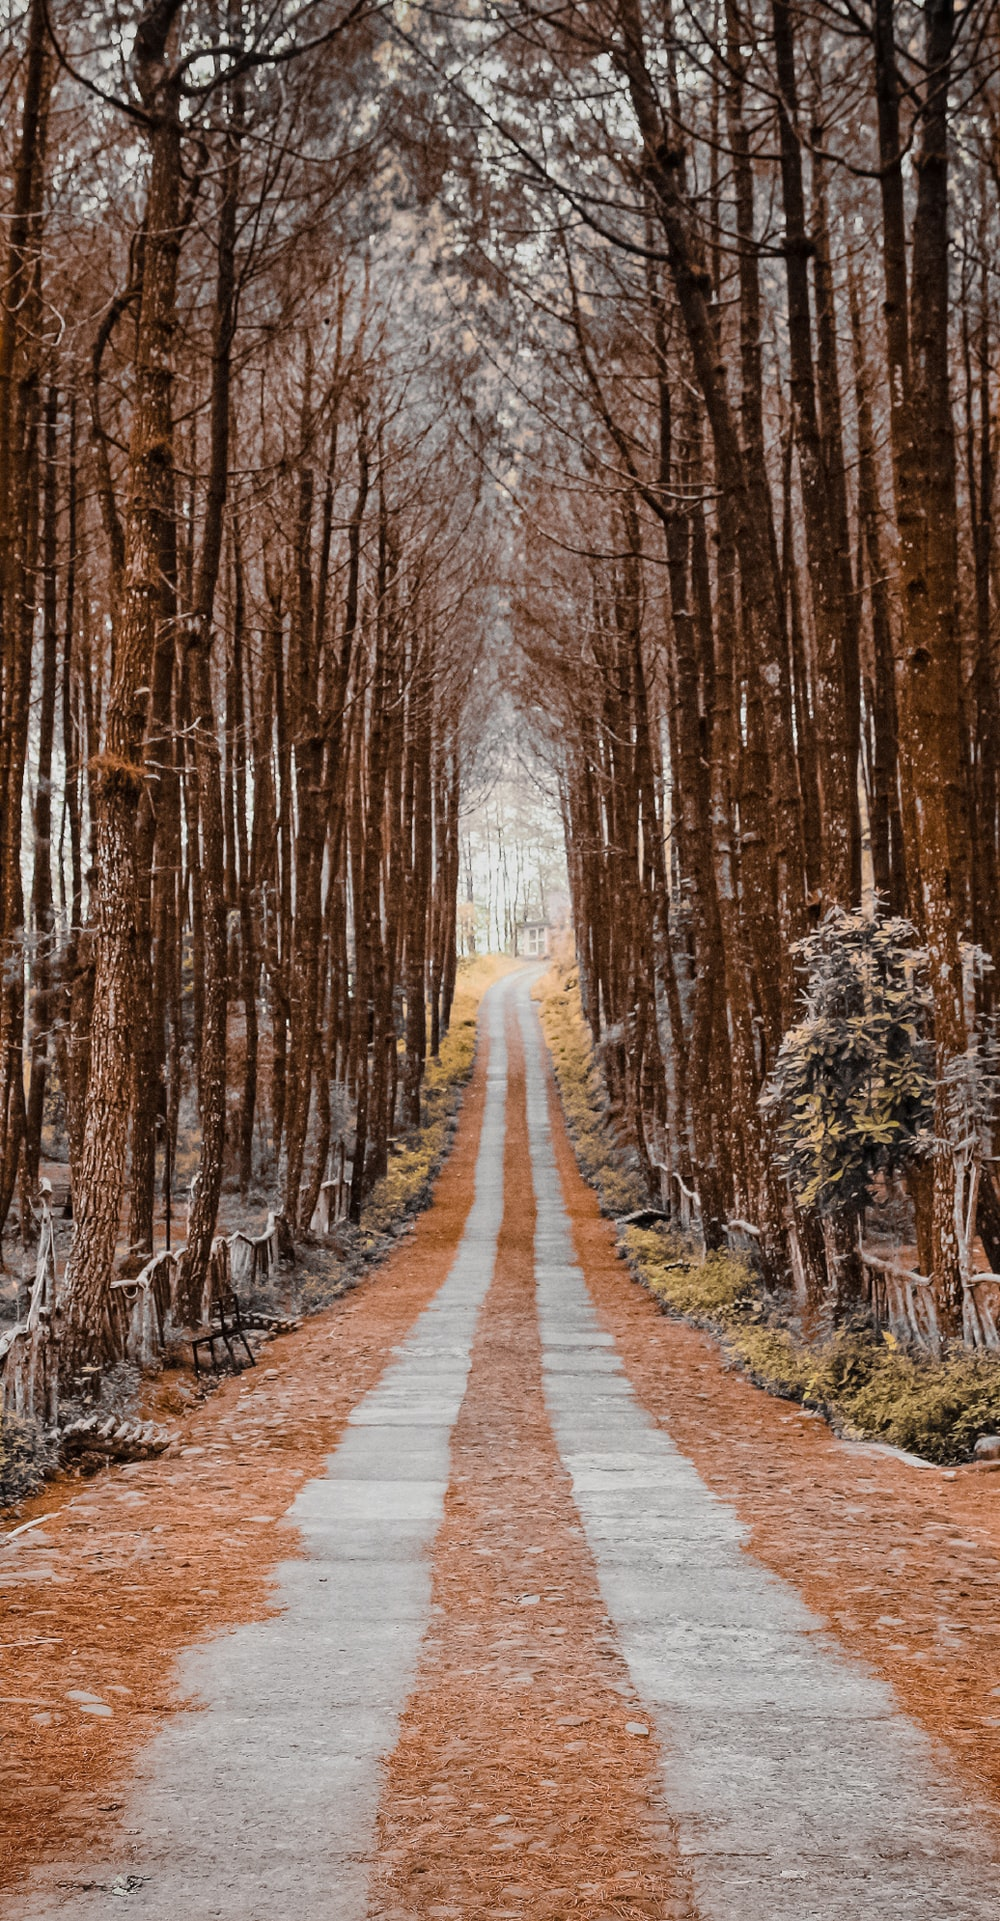 brown pathway between brown trees during daytime